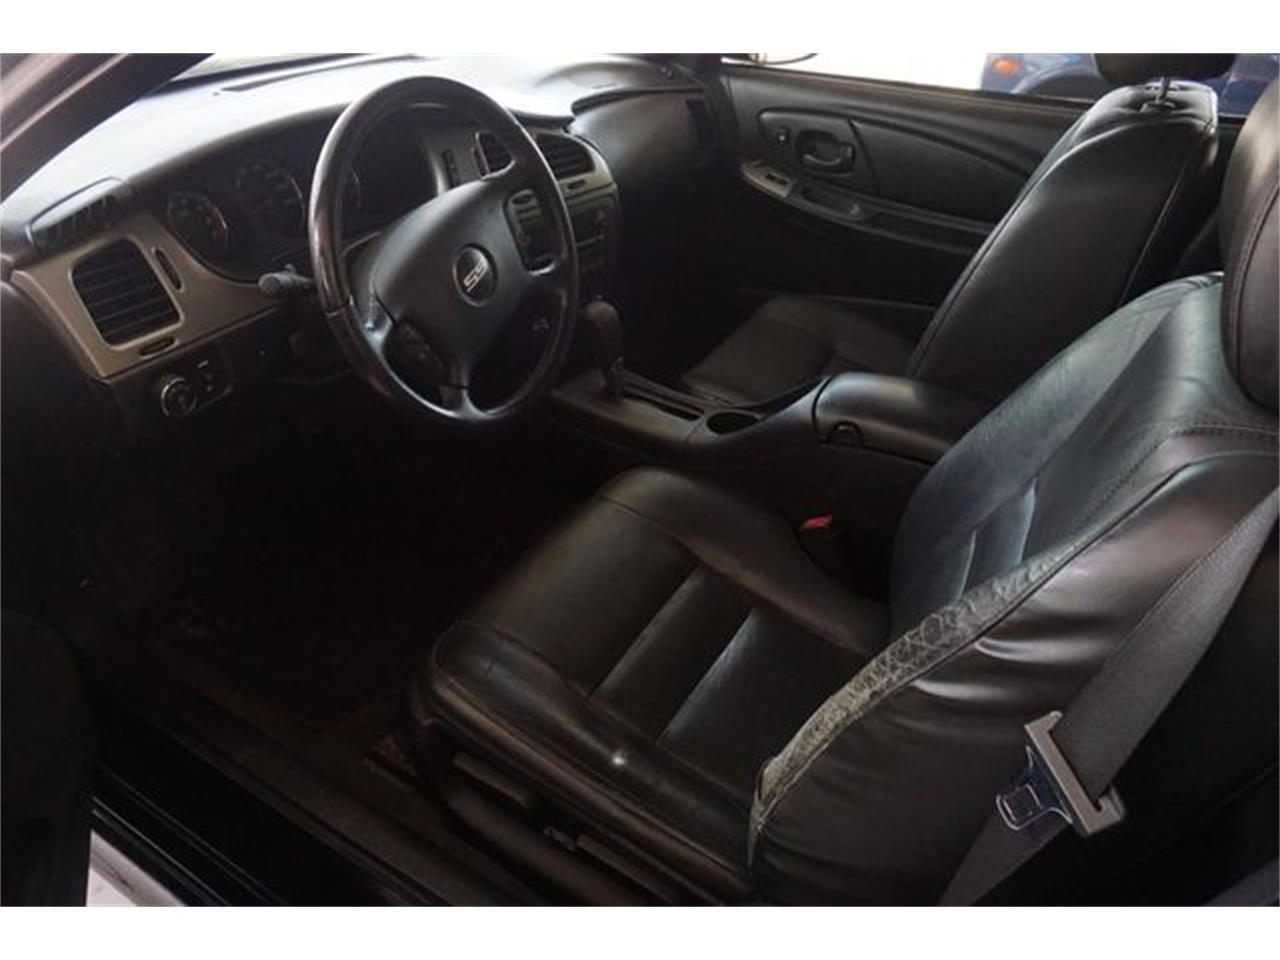 2007 Chevrolet Monte Carlo (CC-1226461) for sale in Blanchard, Oklahoma